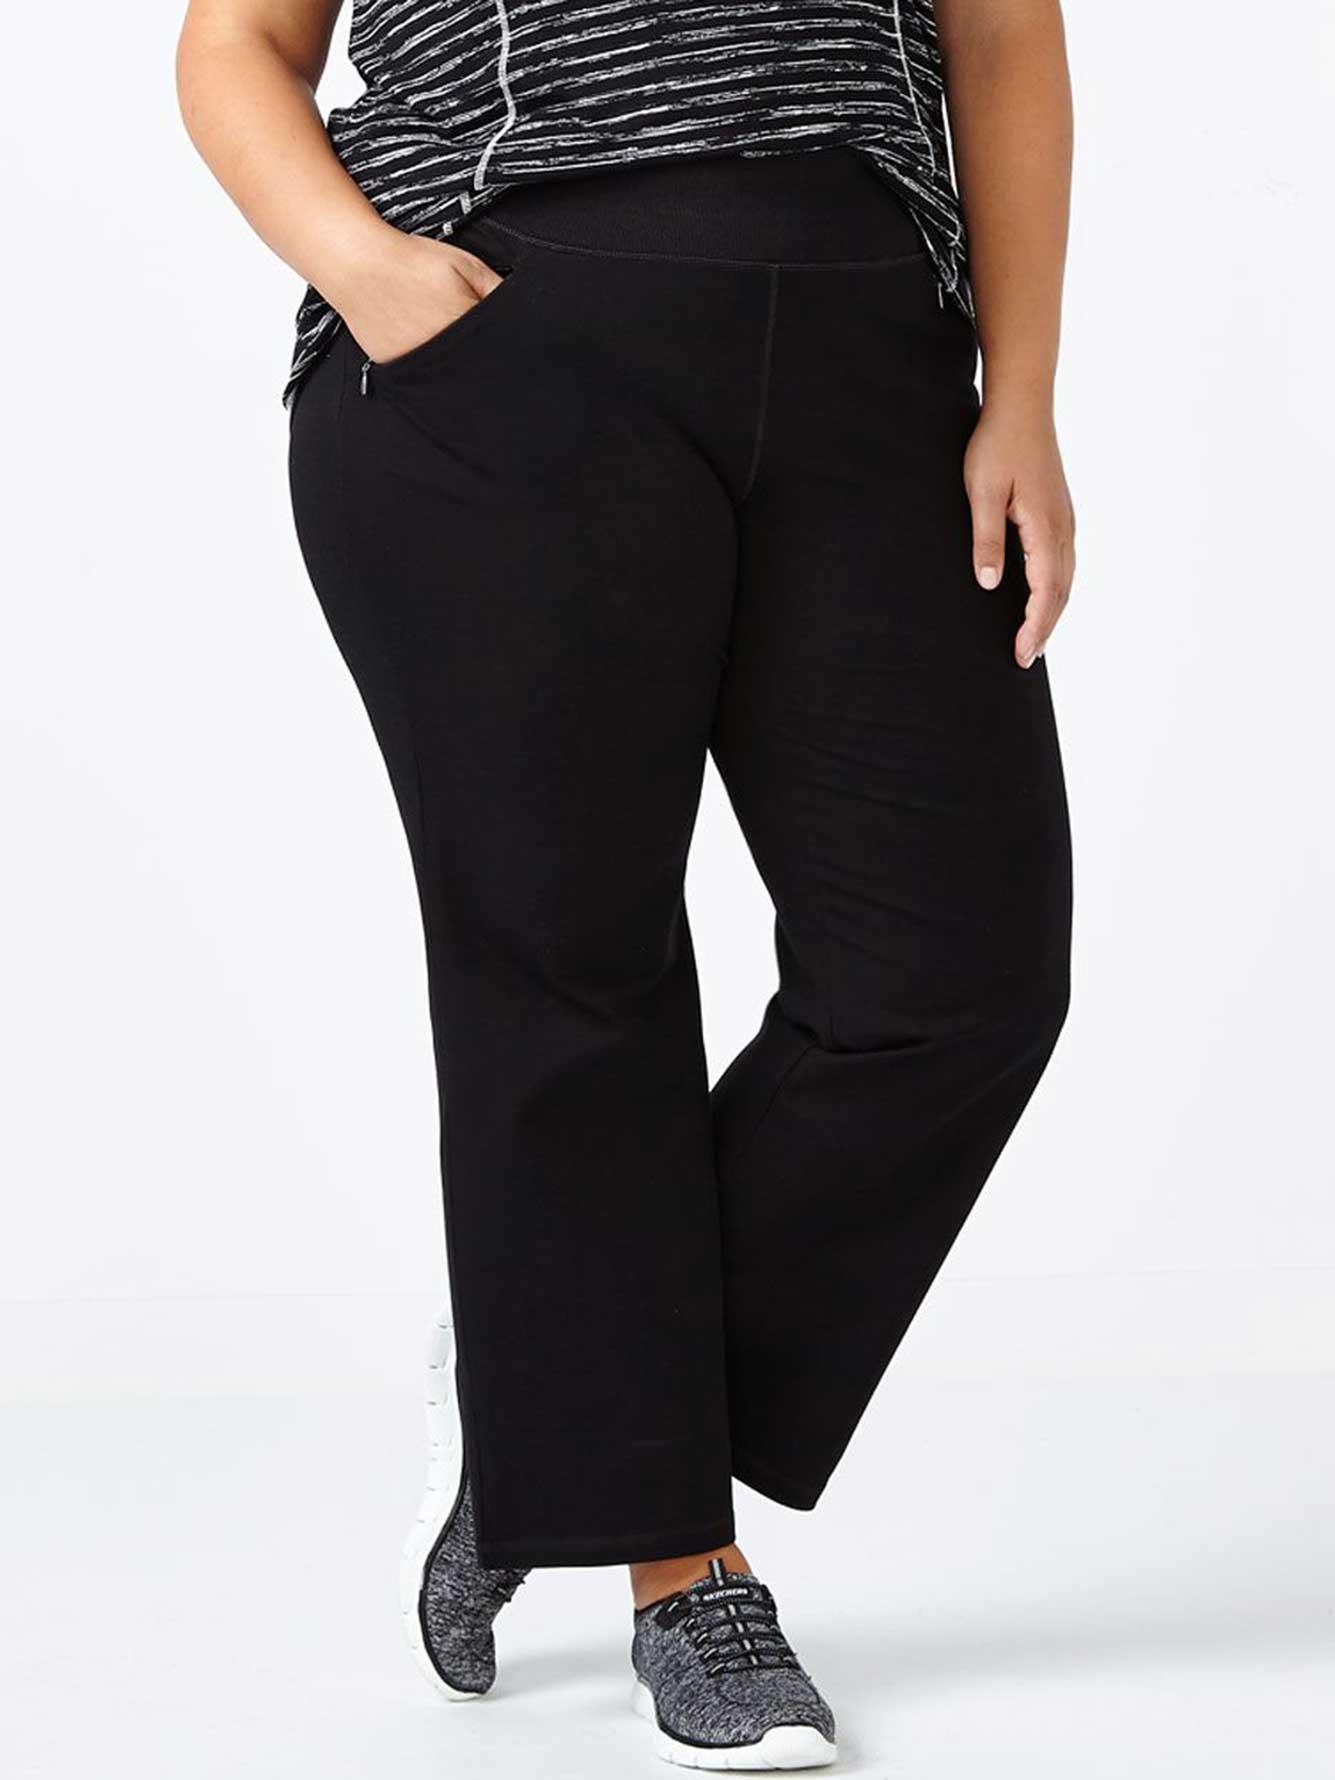 85f7b58c5c9 Essentials - Petite Plus-Size Basic Relaxed Pant